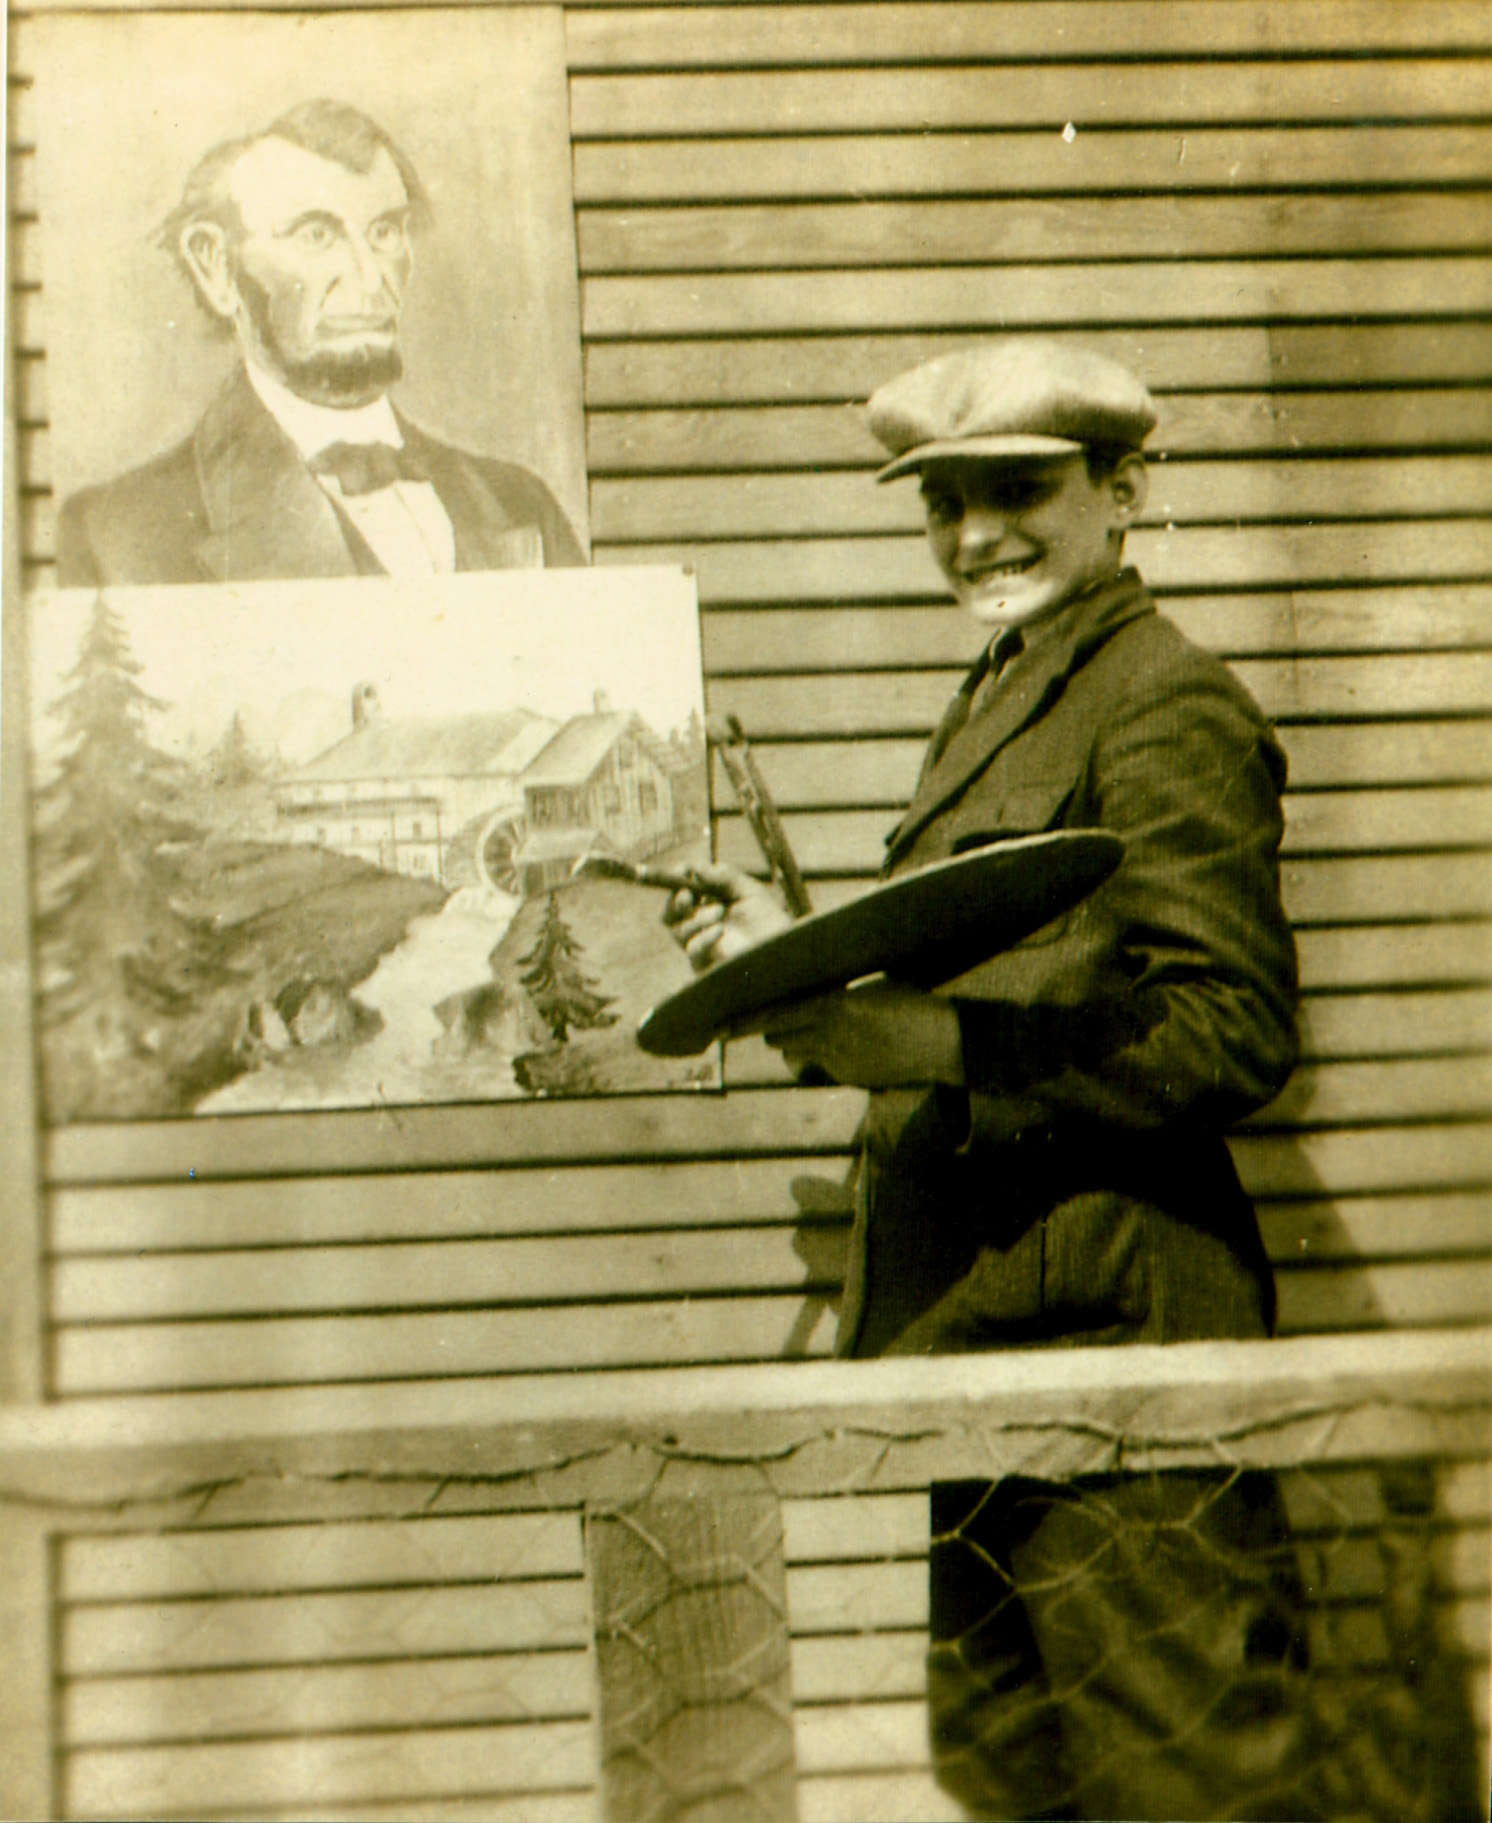 1924 - Chicago - Painting Scene from Memory of Riedlingsdorf